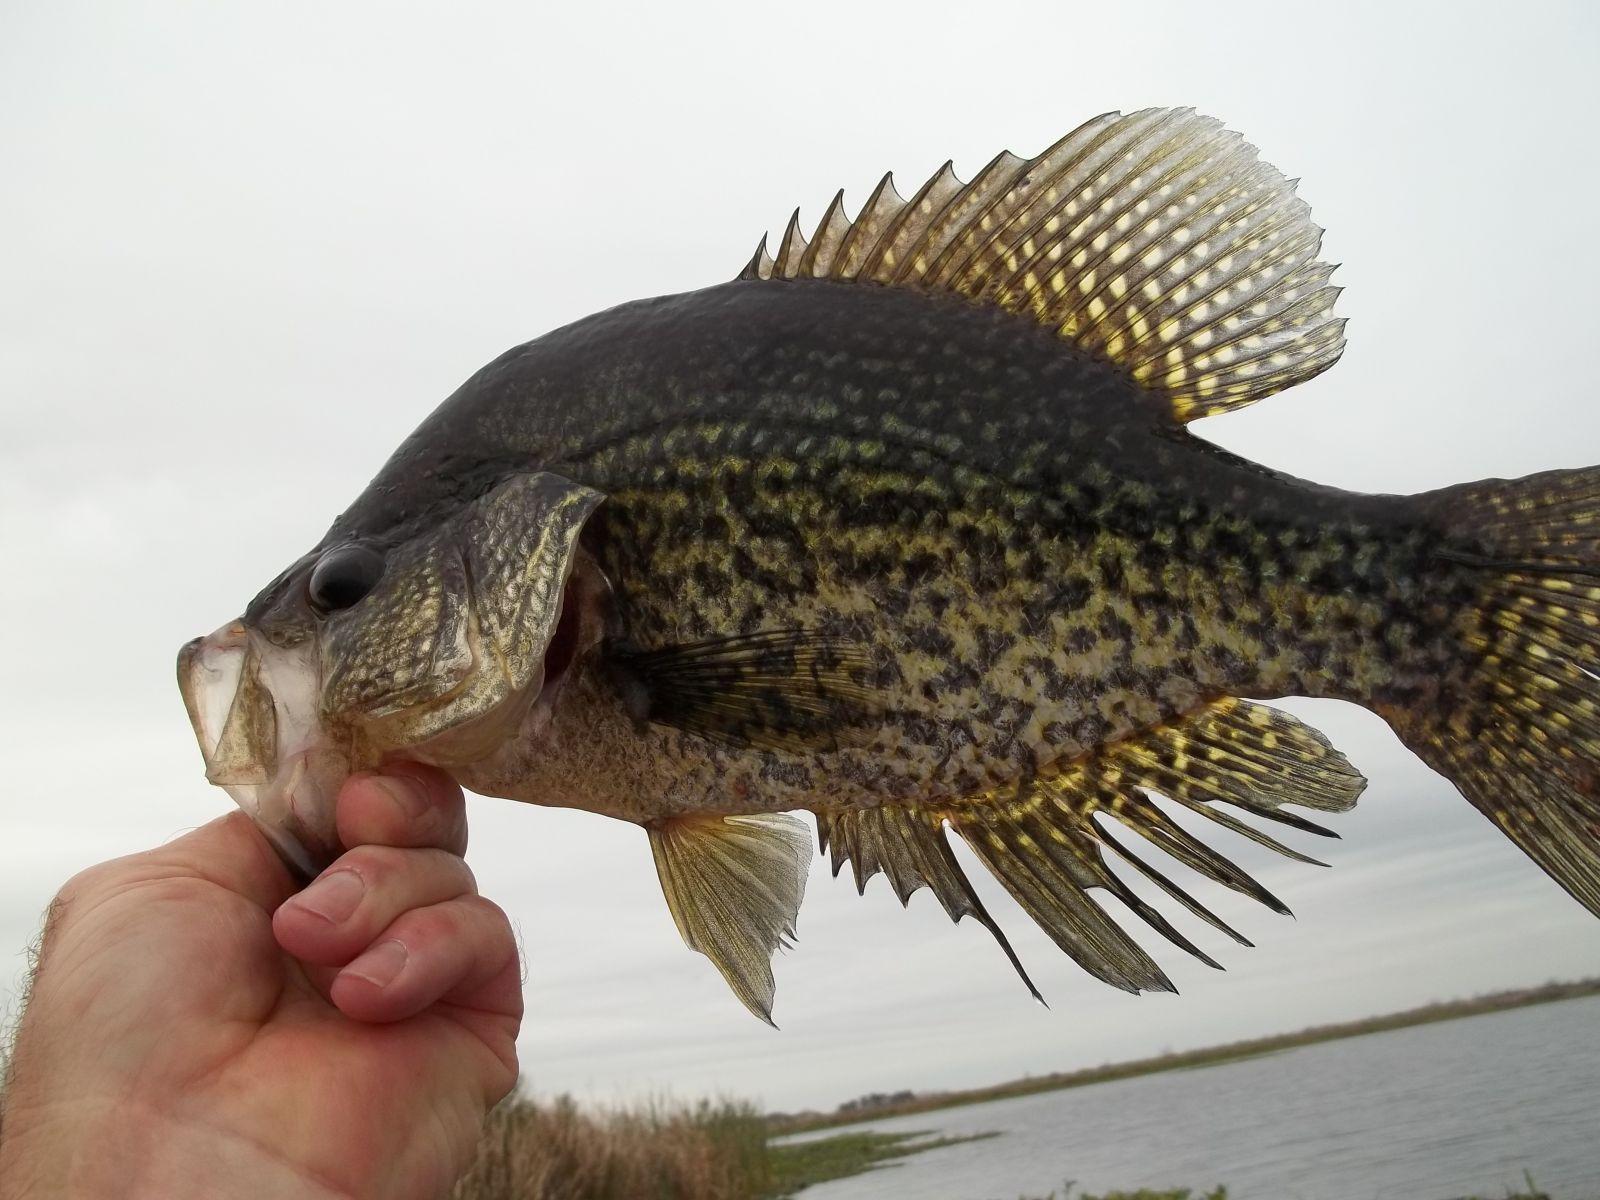 South Louisiana Crappie Feb. 12'